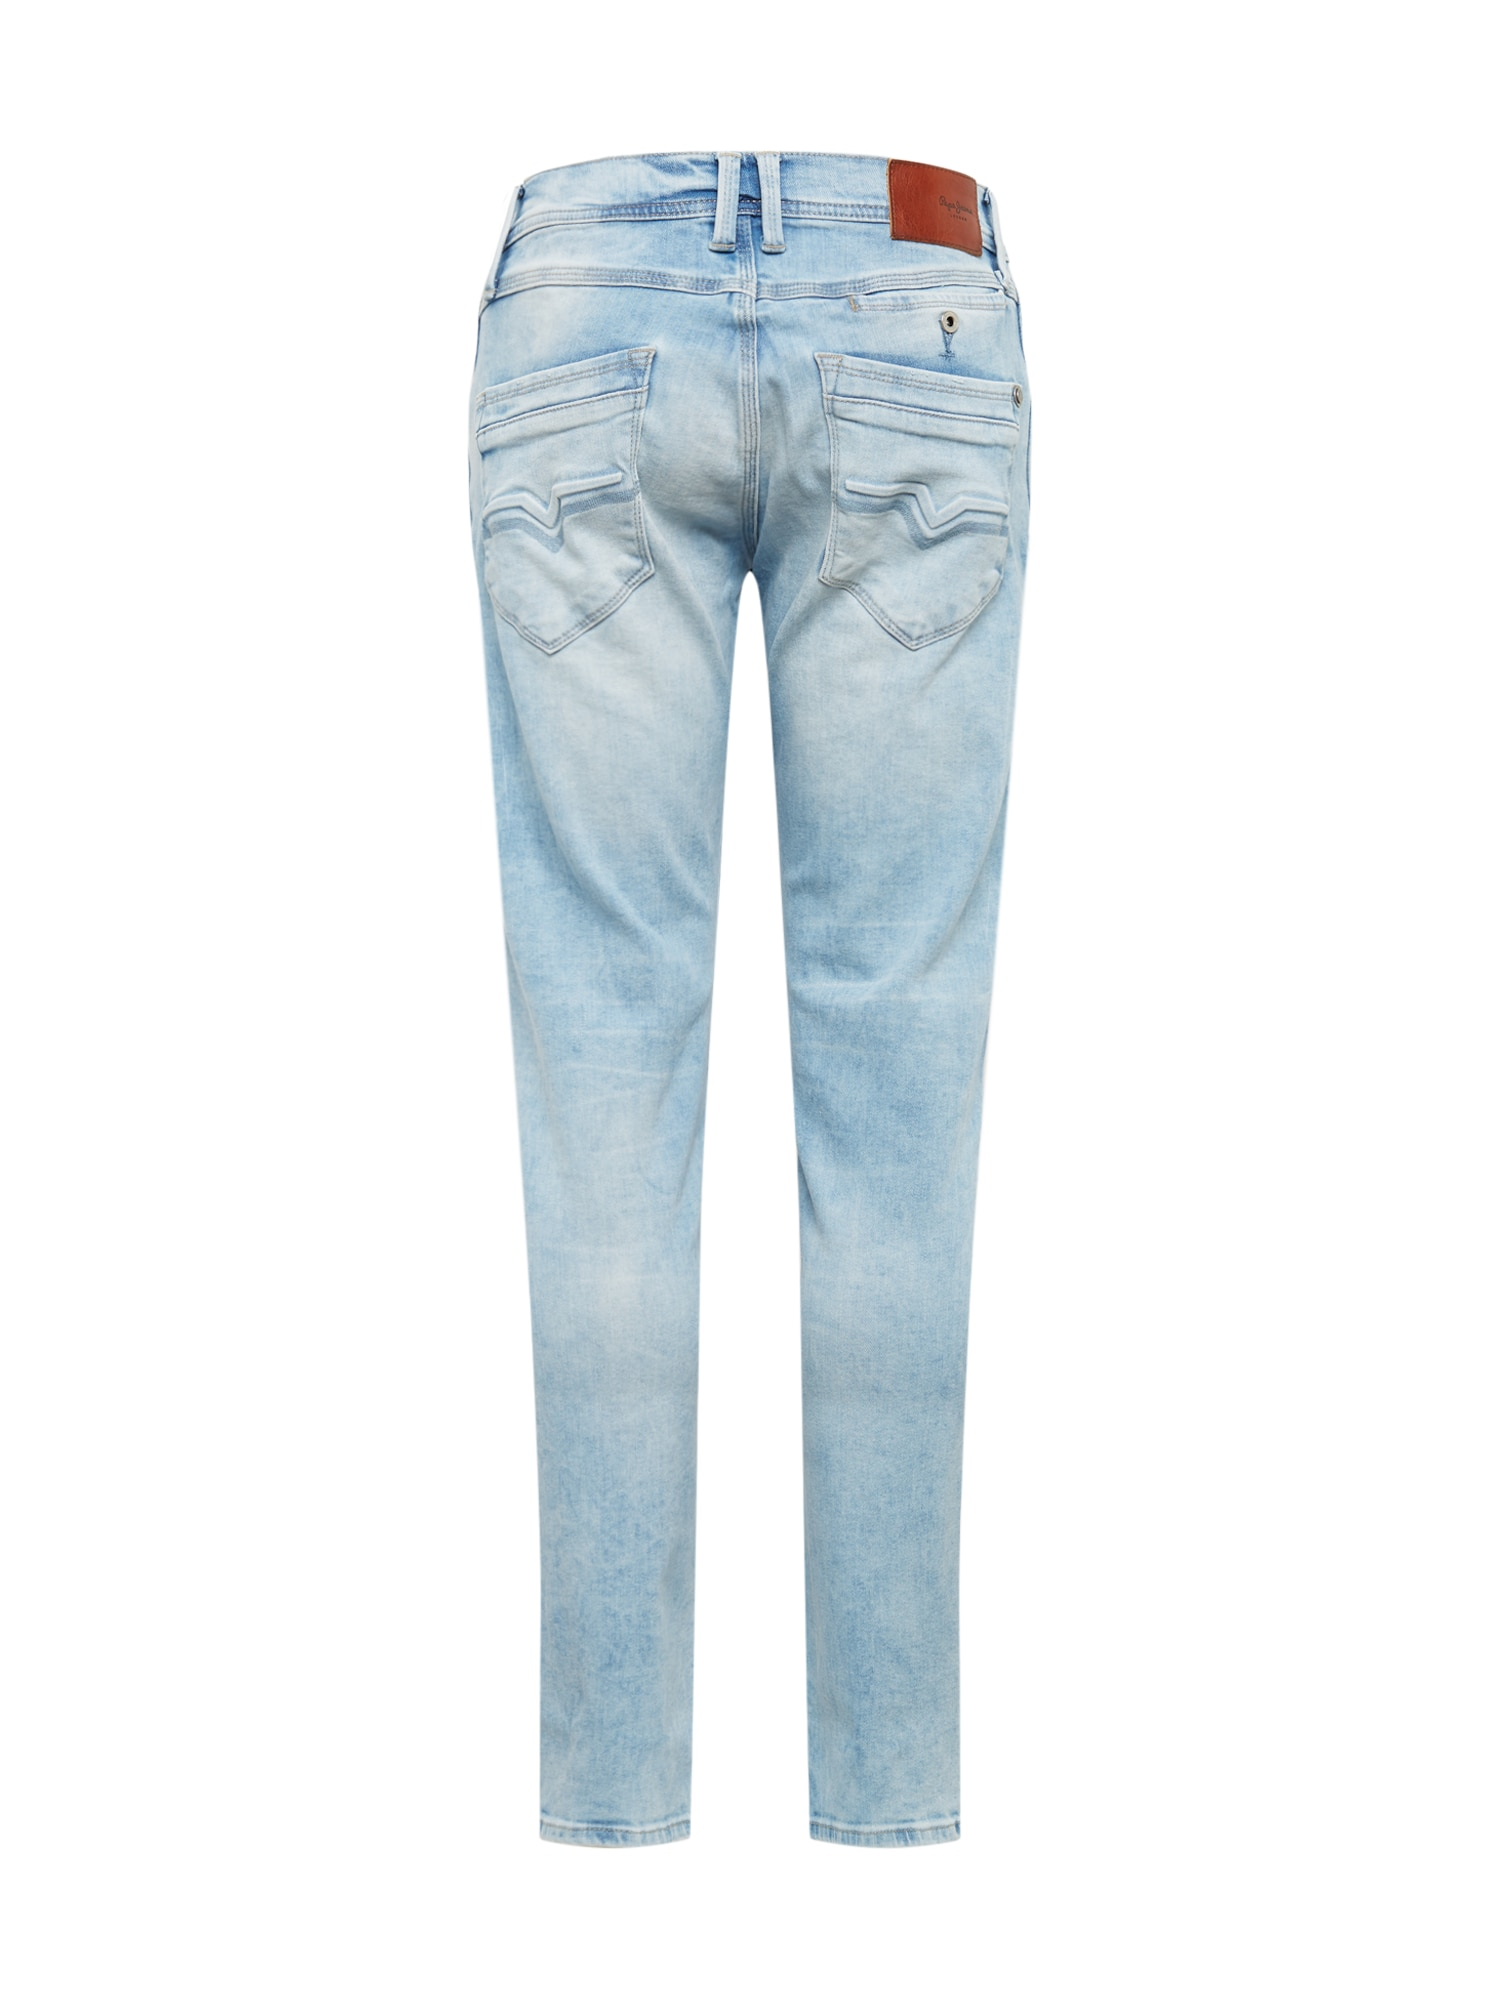 Pepe Jeans Jeans 'Spike'  blå denim